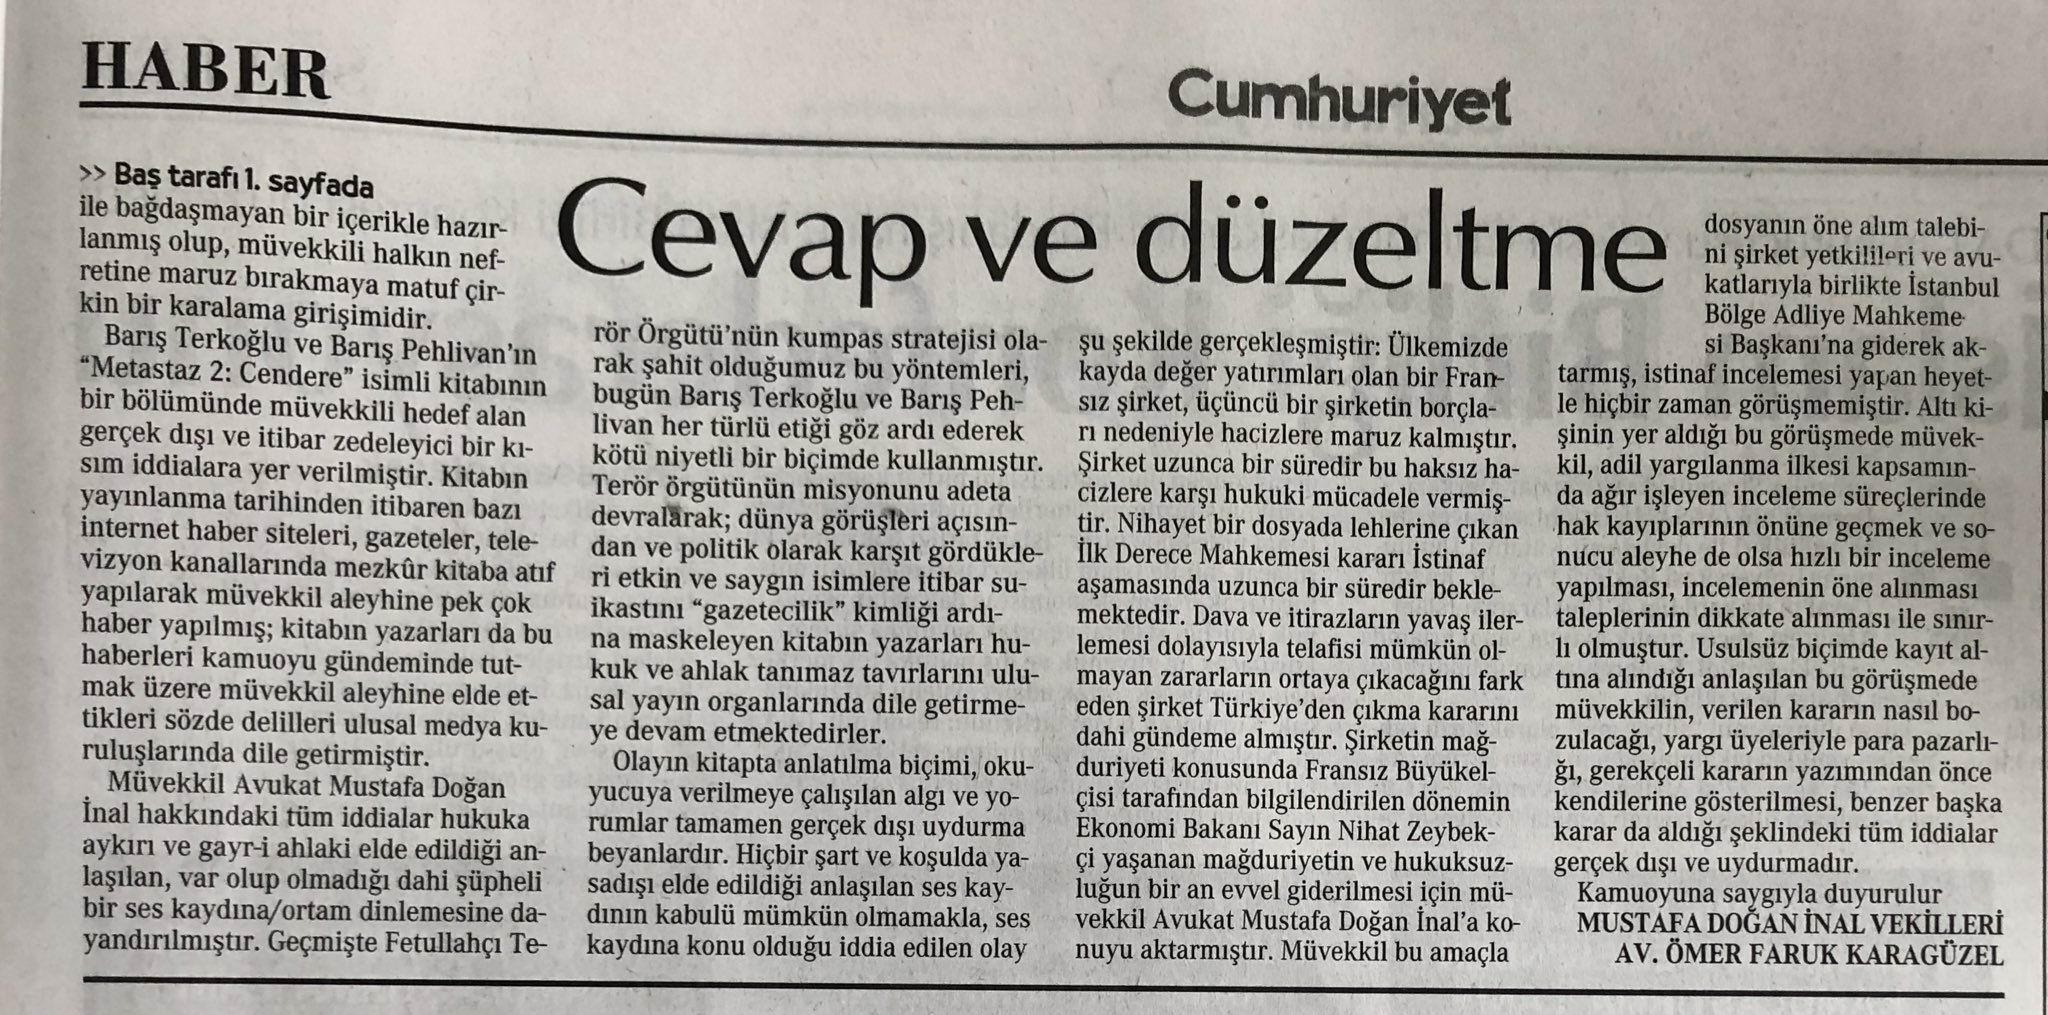 cumhuriyet-gazetesi-icerik.jpg